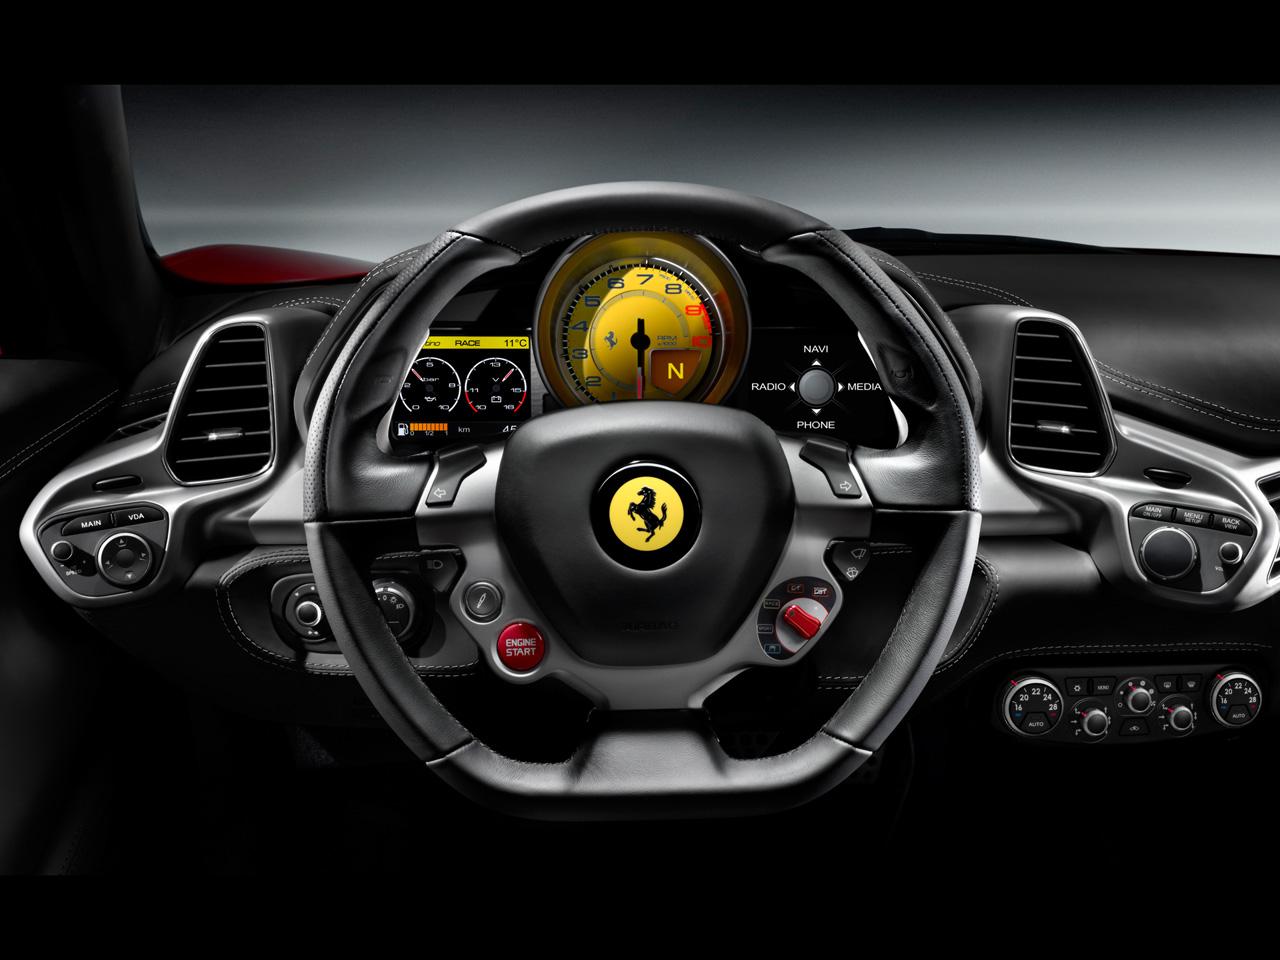 http://2.bp.blogspot.com/_XAfd_7tucsw/S9BLJcUuvKI/AAAAAAAAELQ/TB4CggaBEqg/s1600/2010+Ferrari+458+Italia+-+Dashboard.jpg